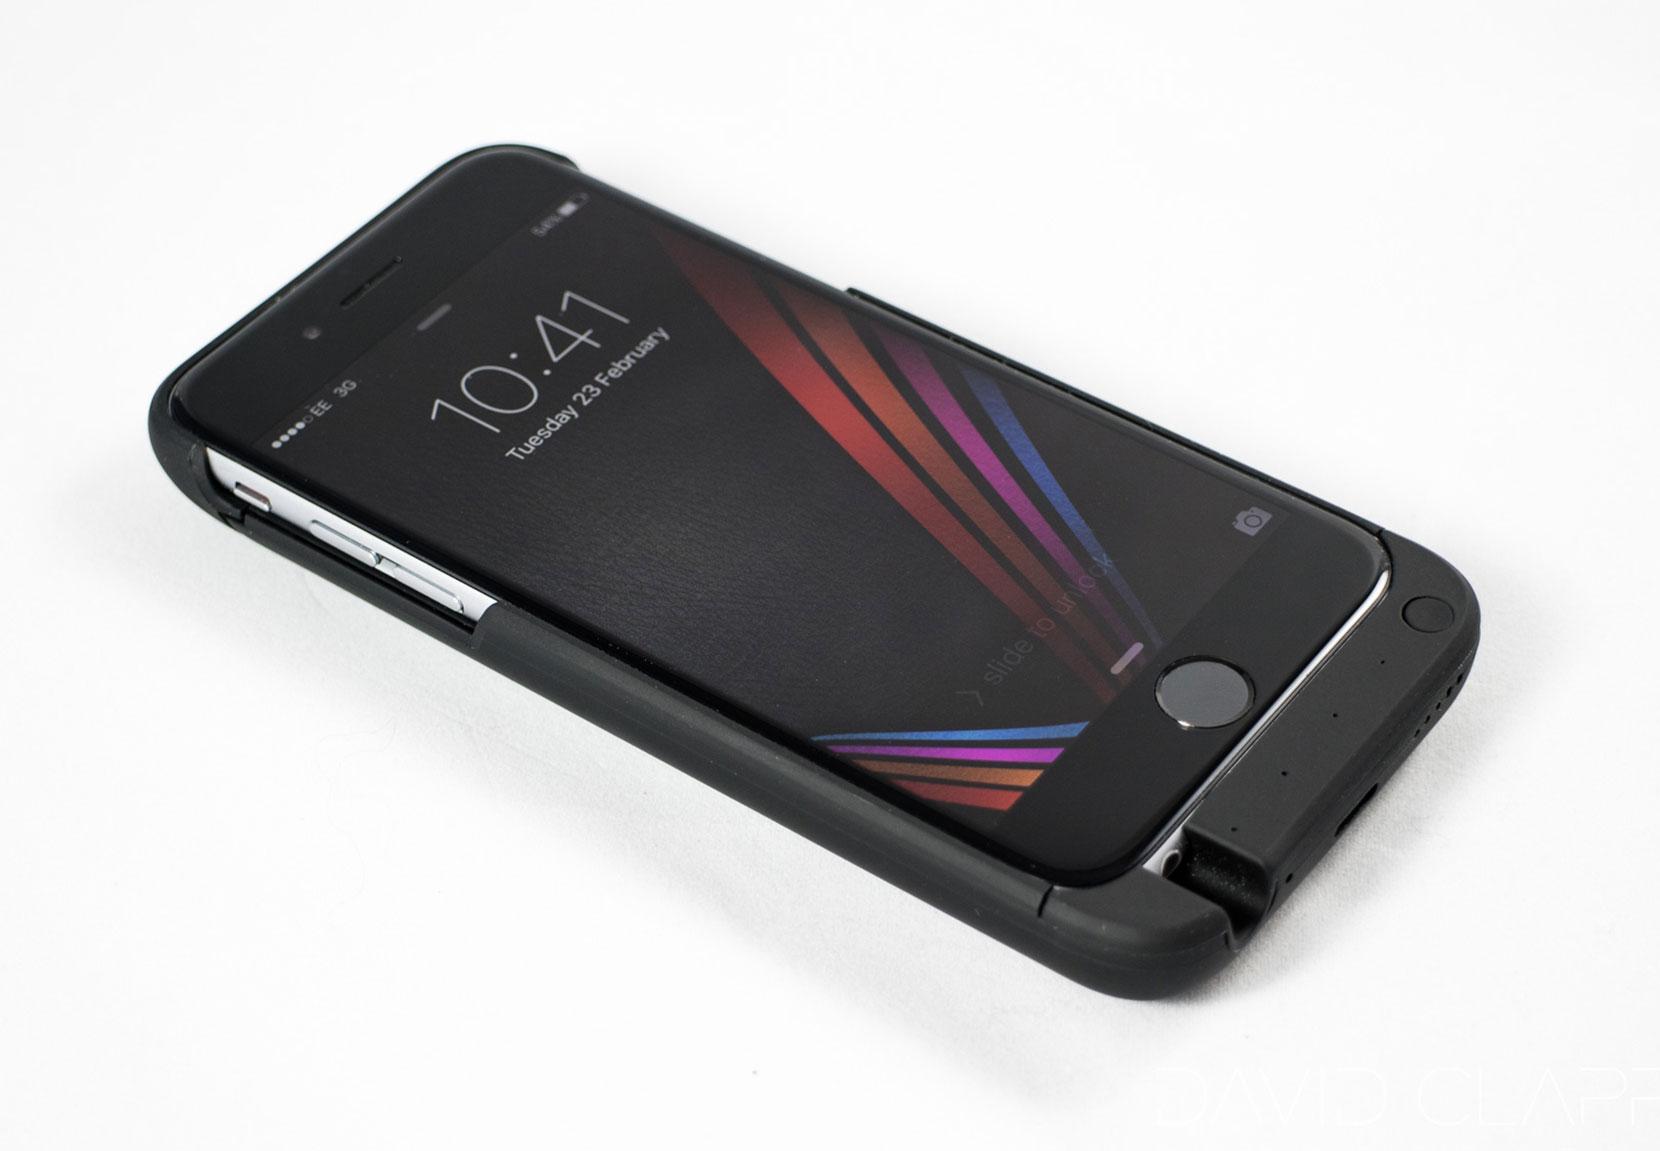 iPhone 6s Powercase 7000mah for Photographers